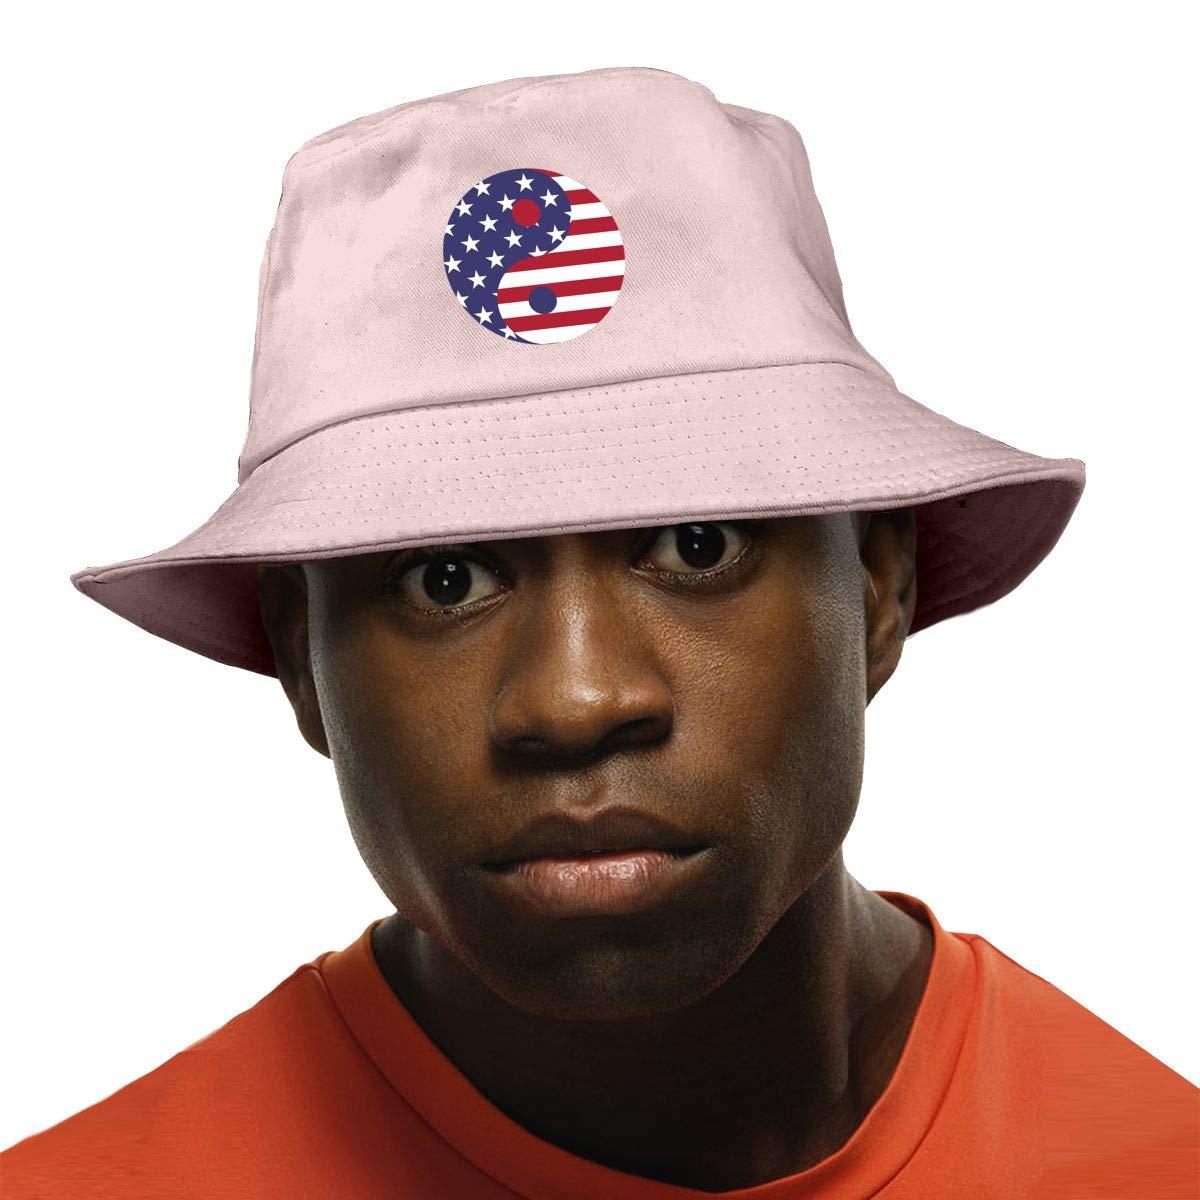 PPAN American Unisex Cotton Packable White Travel Bucket Hat Fishing Cap